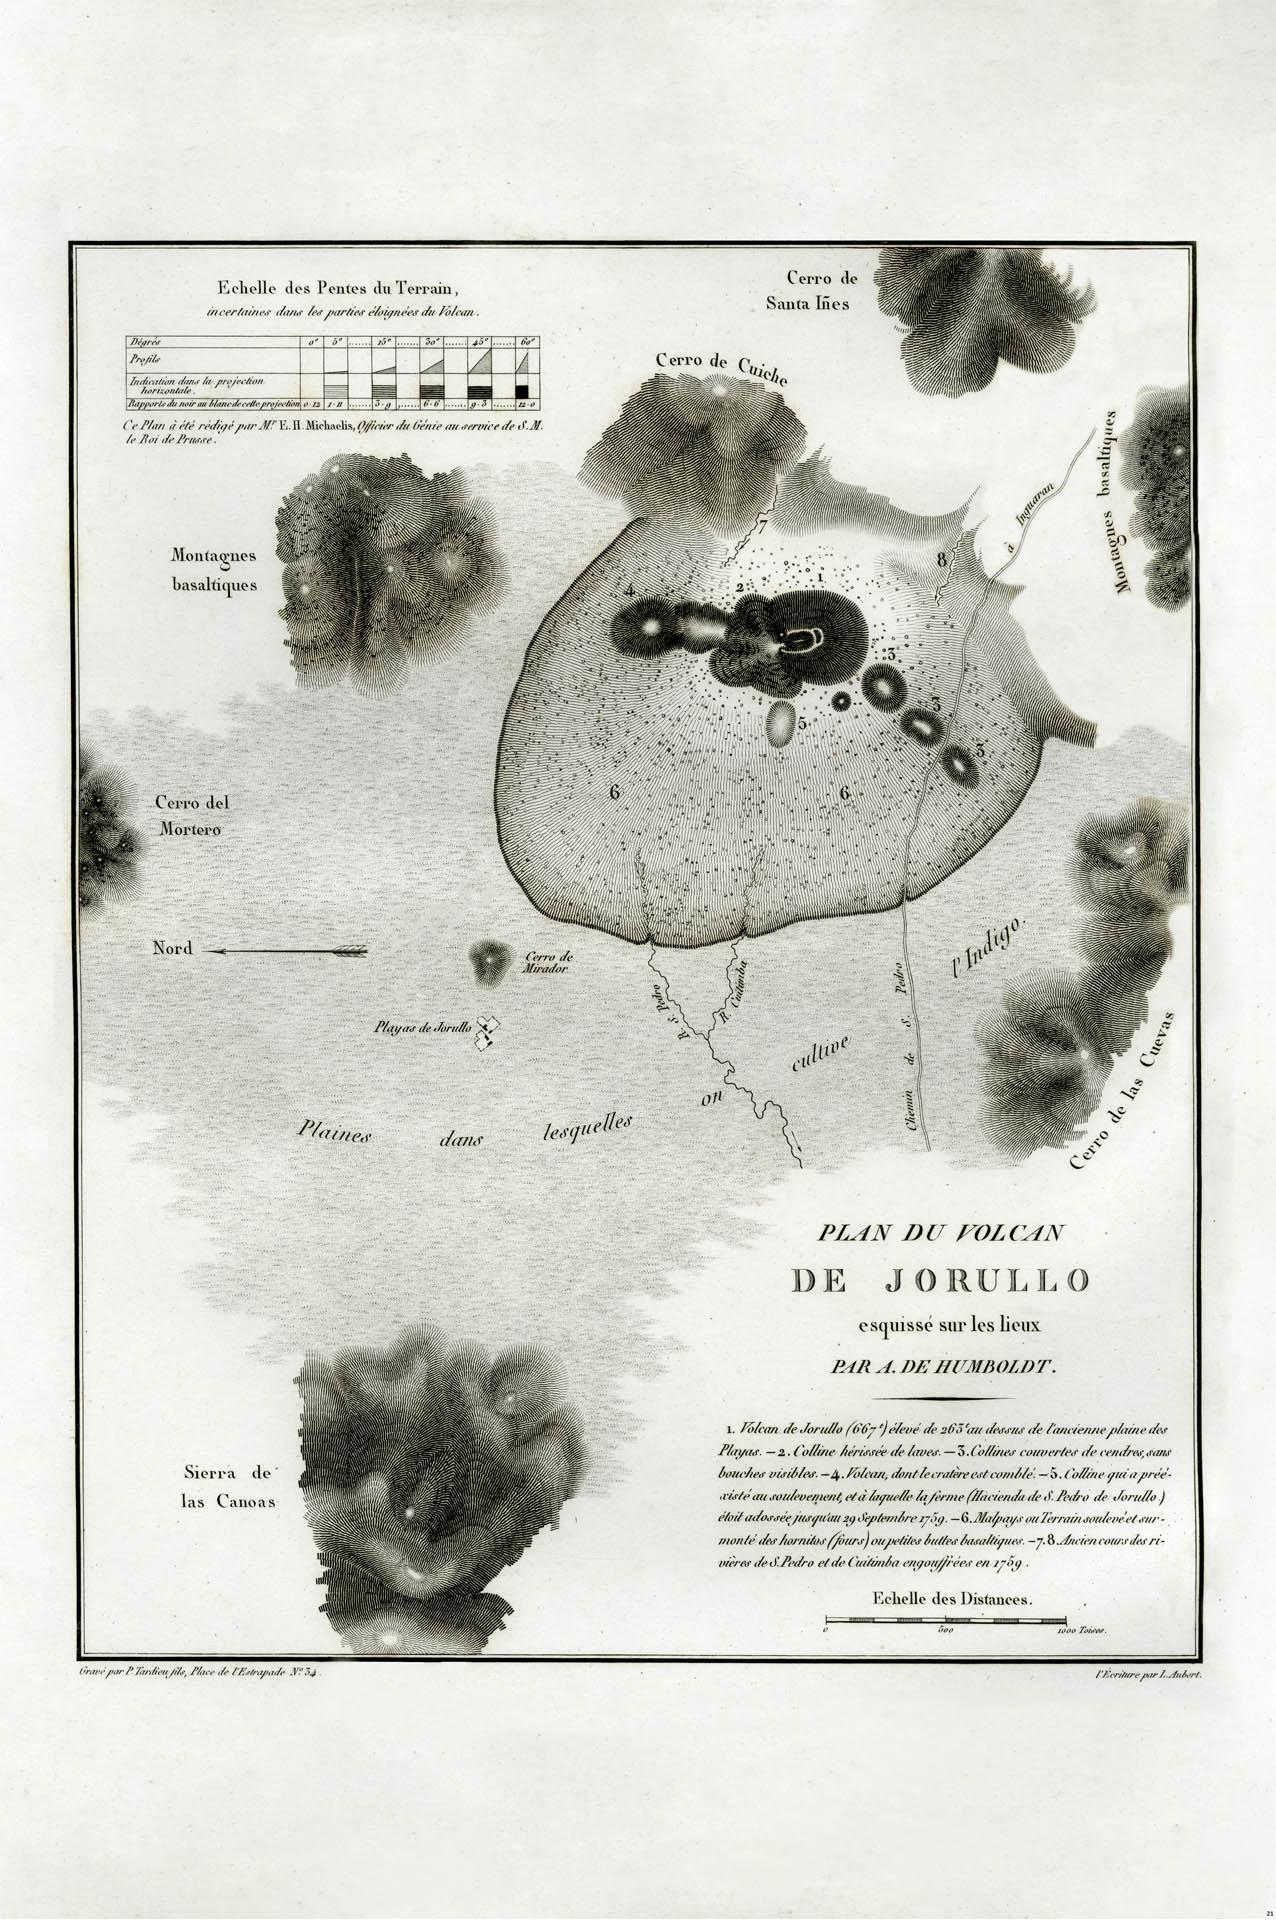 Plano del volcán de Jorullo